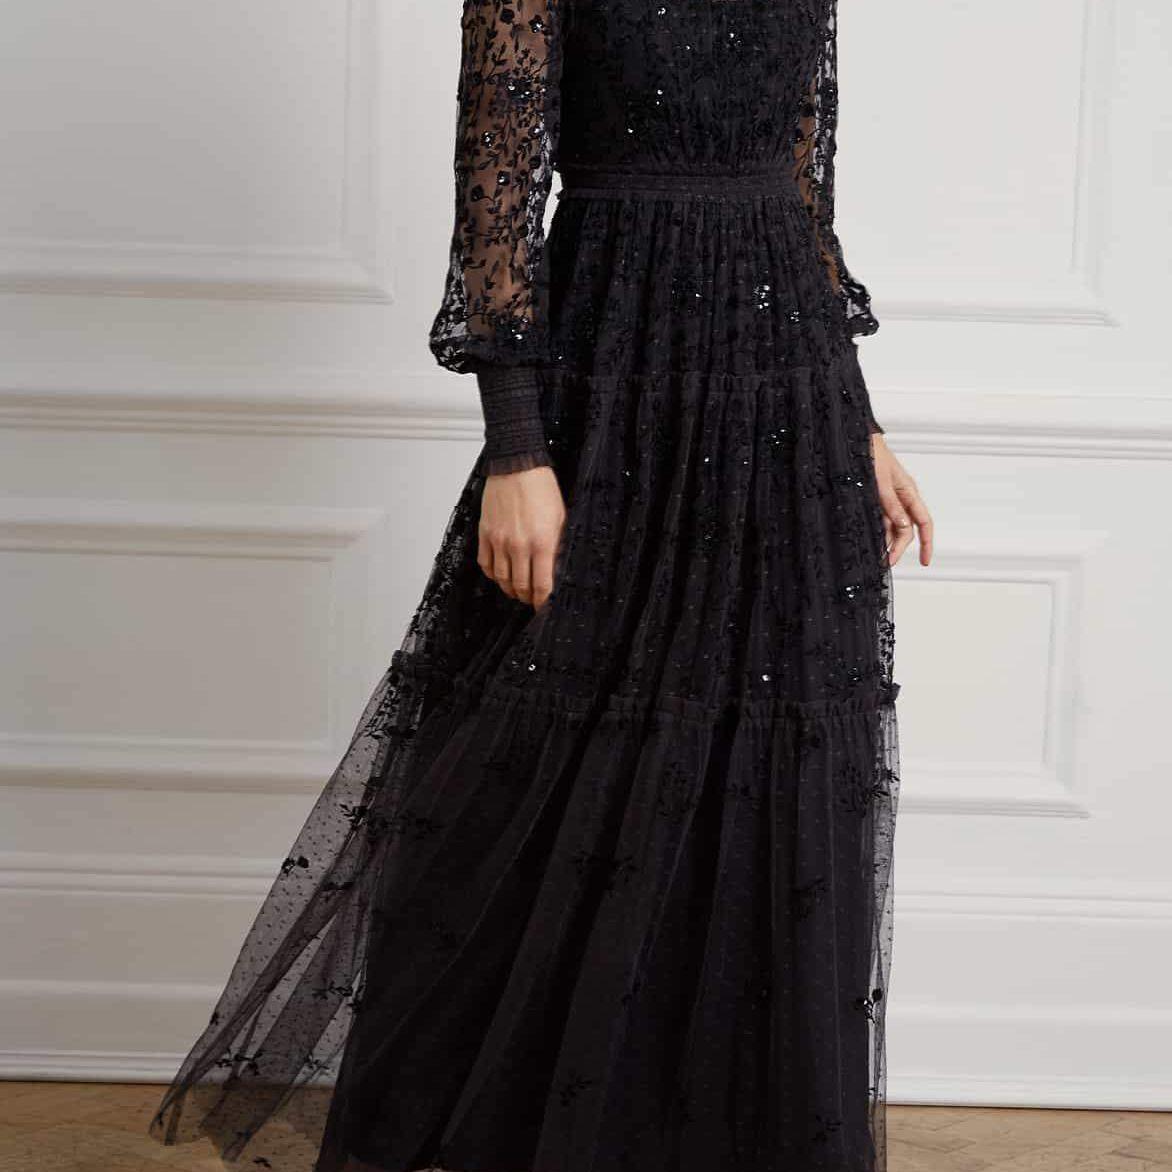 The 37 Best Black Wedding Dresses Of 2020,Wedding Dresses Toronto Online